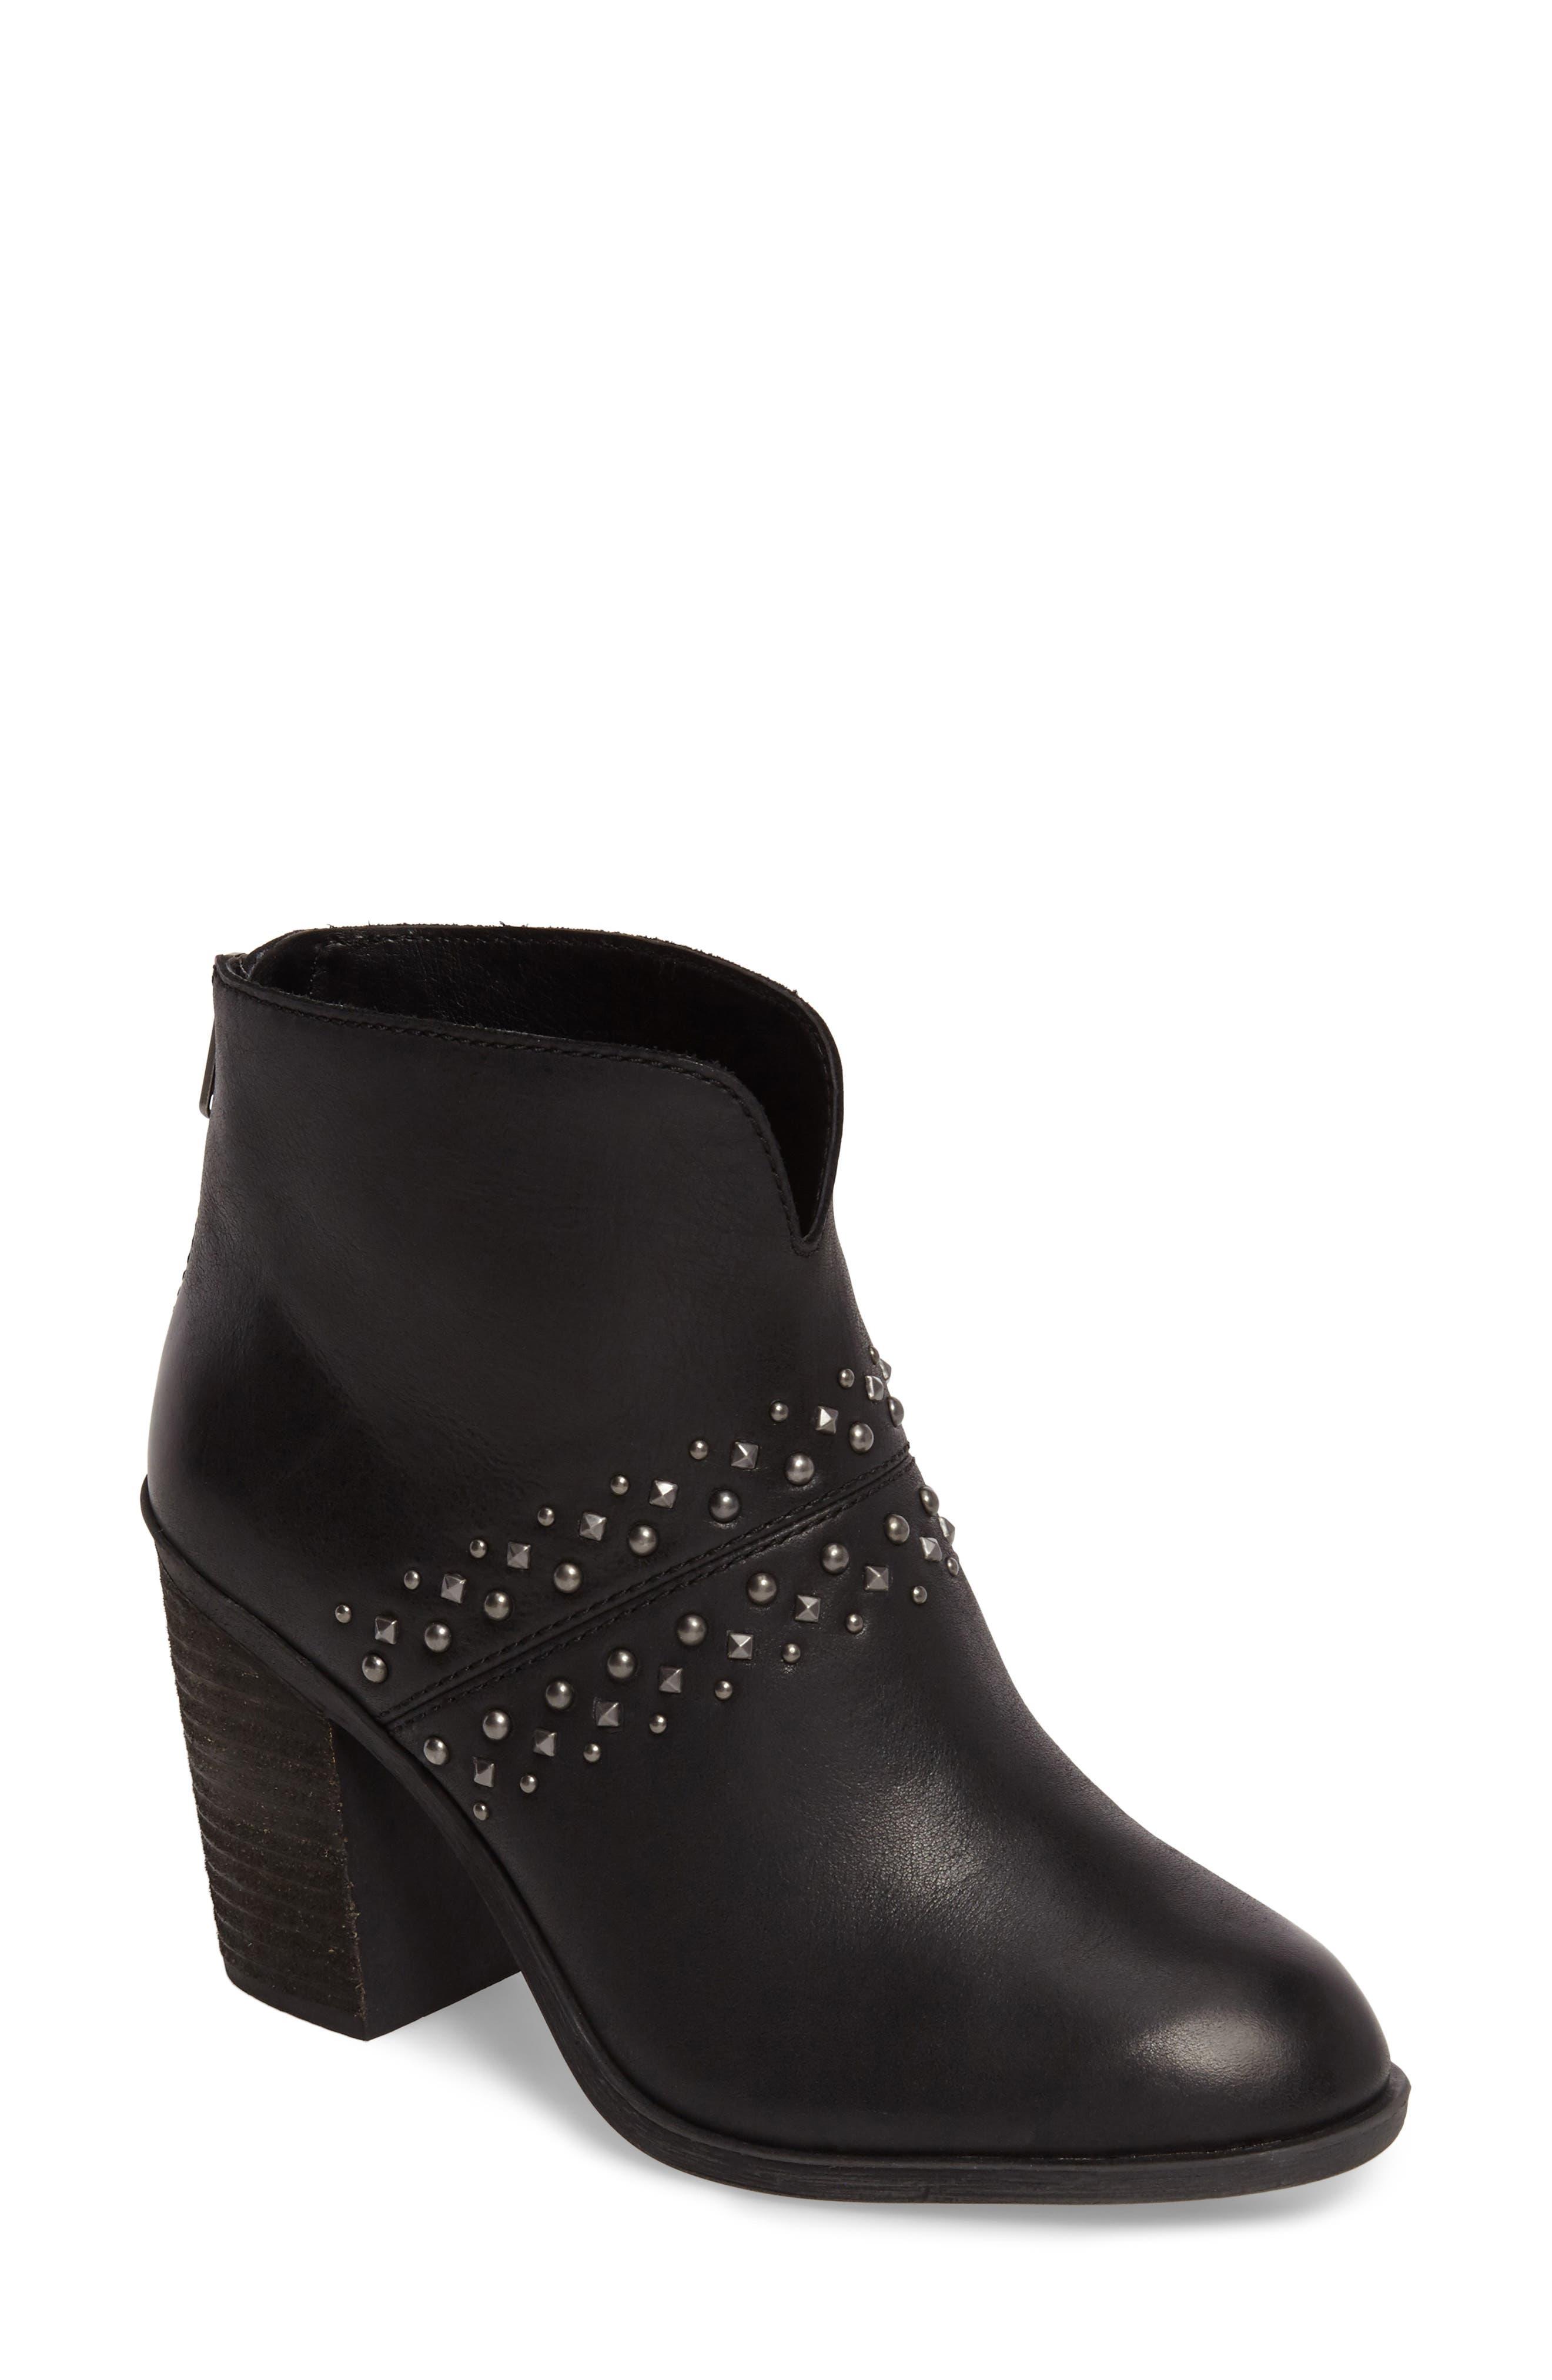 Sancha Studded Bootie,                         Main,                         color, Black Leather